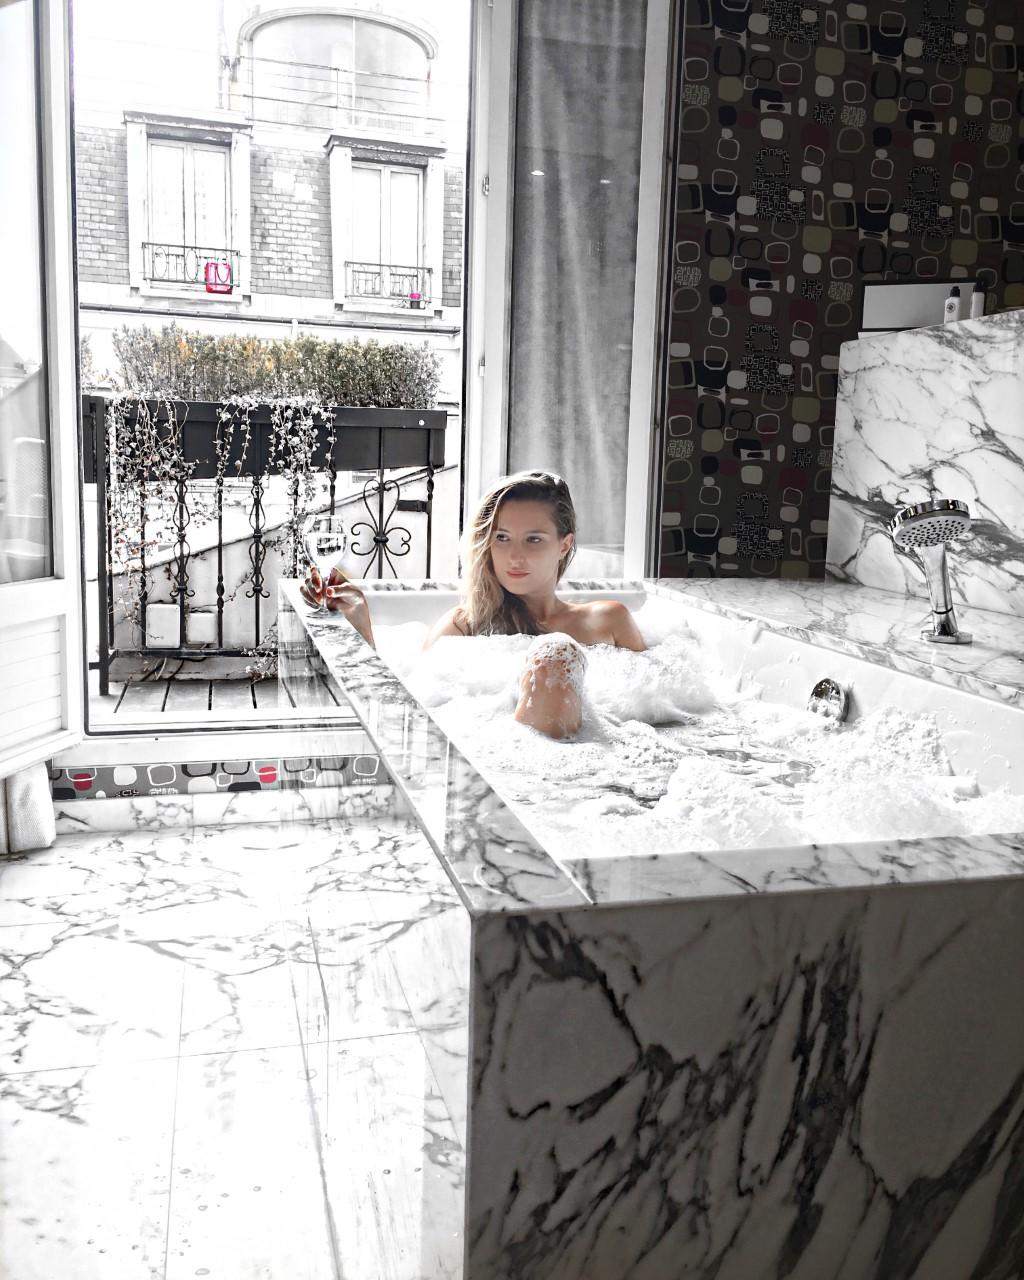 Hotel_Artus_Paris_Bymyheels_Lara_Martin_Gilarranz (3)